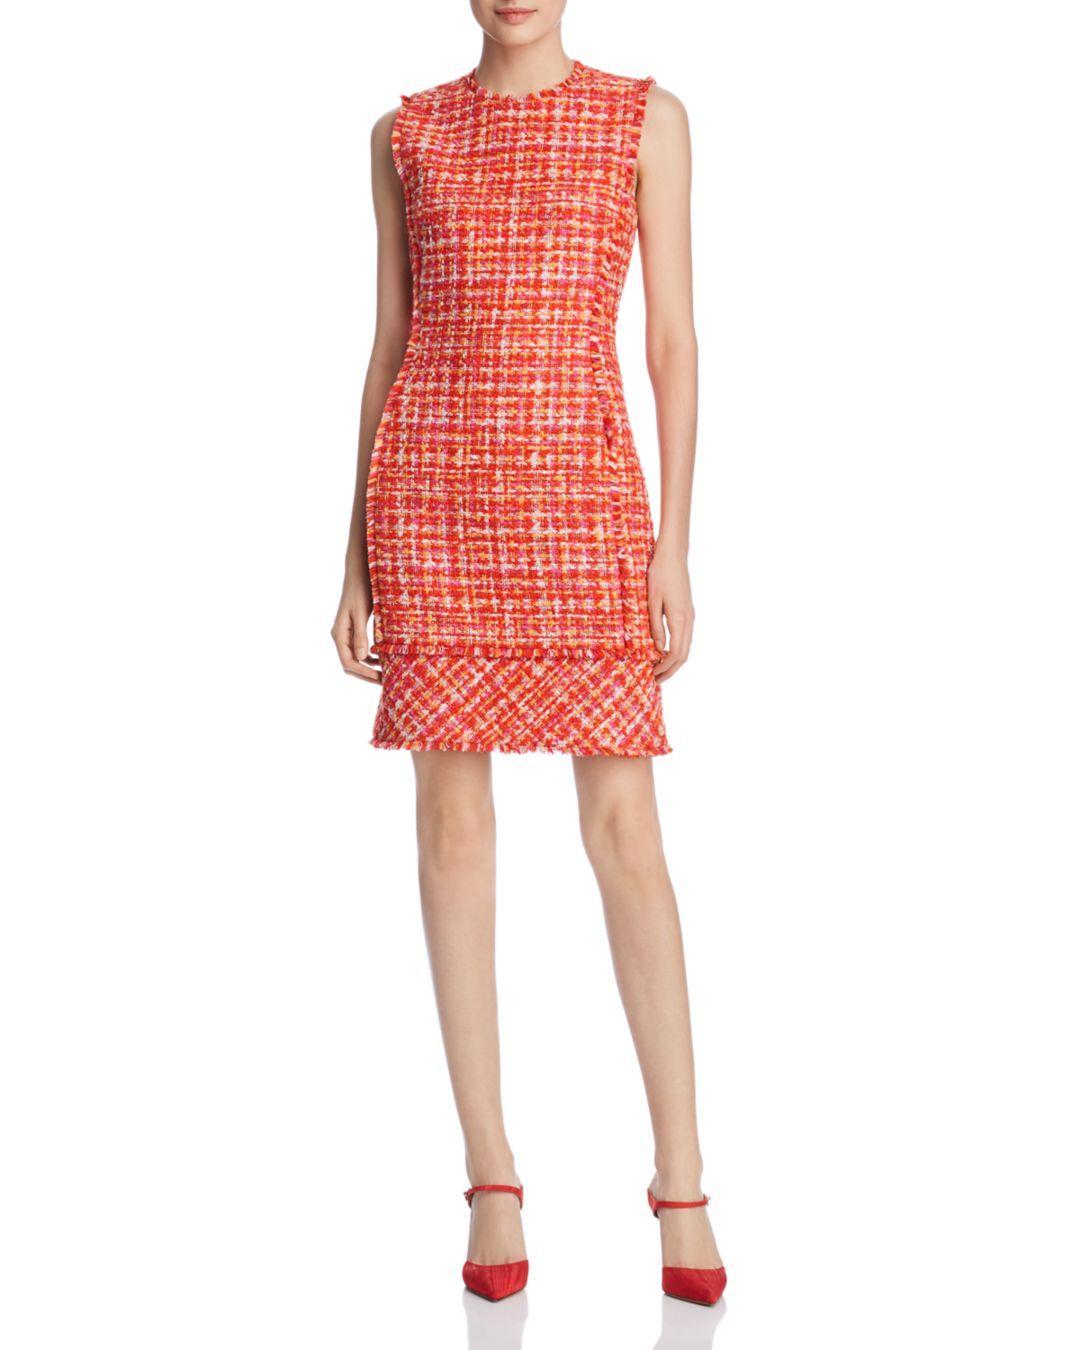 01f7a271b0e2 Elie Tahari Andrea Tweed Sheath Dress in Red - Save 46% - Lyst